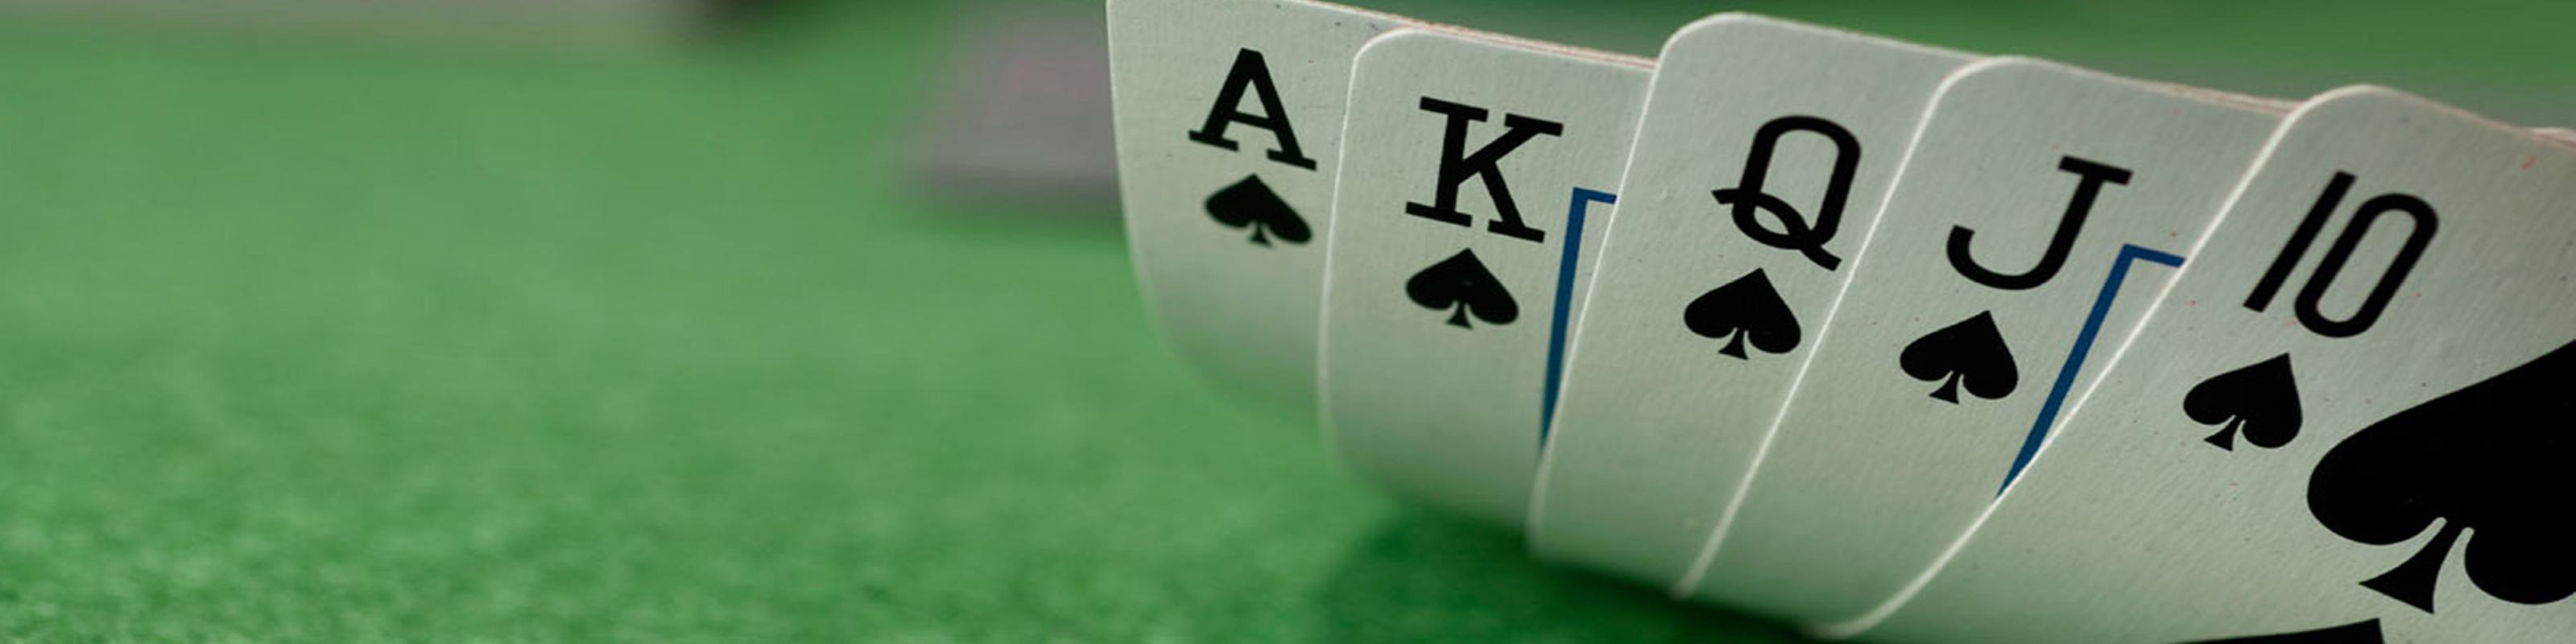 poker nights ireland